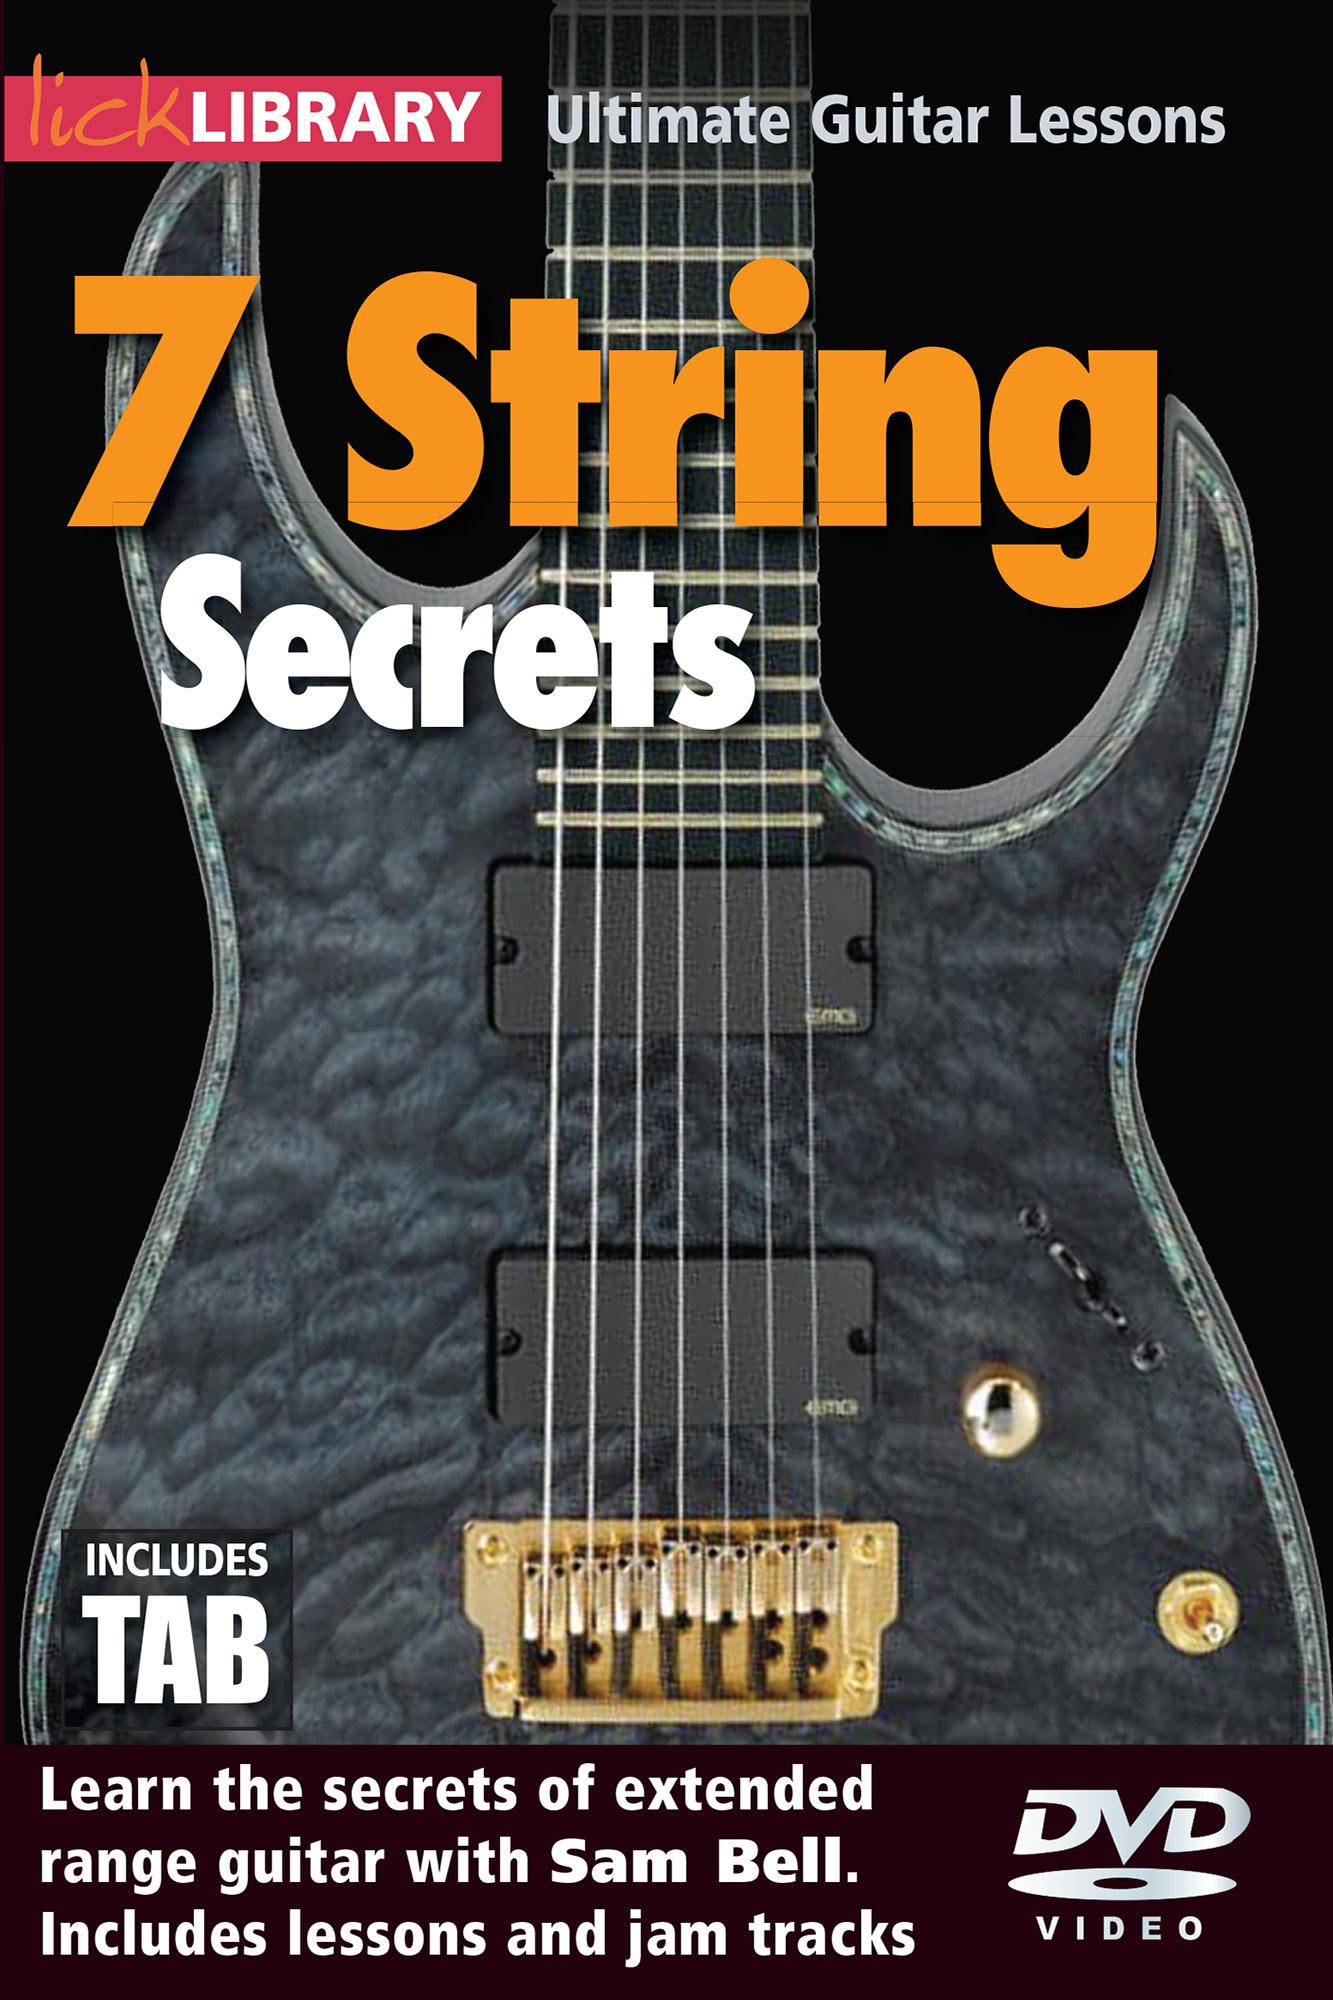 Seven String Secrets